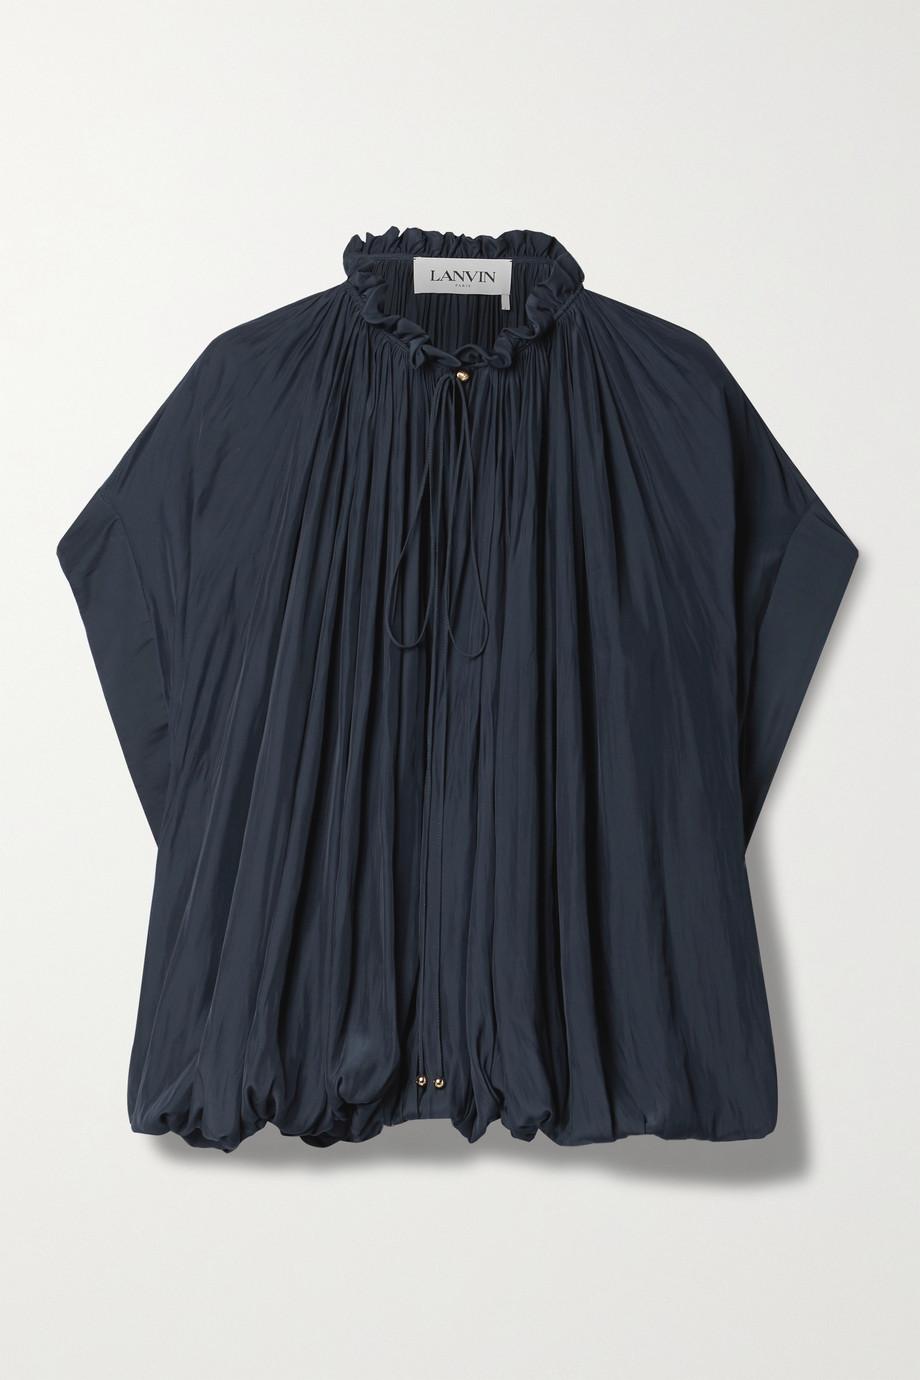 Lanvin Tie-detailed gathered crepe de chine blouse